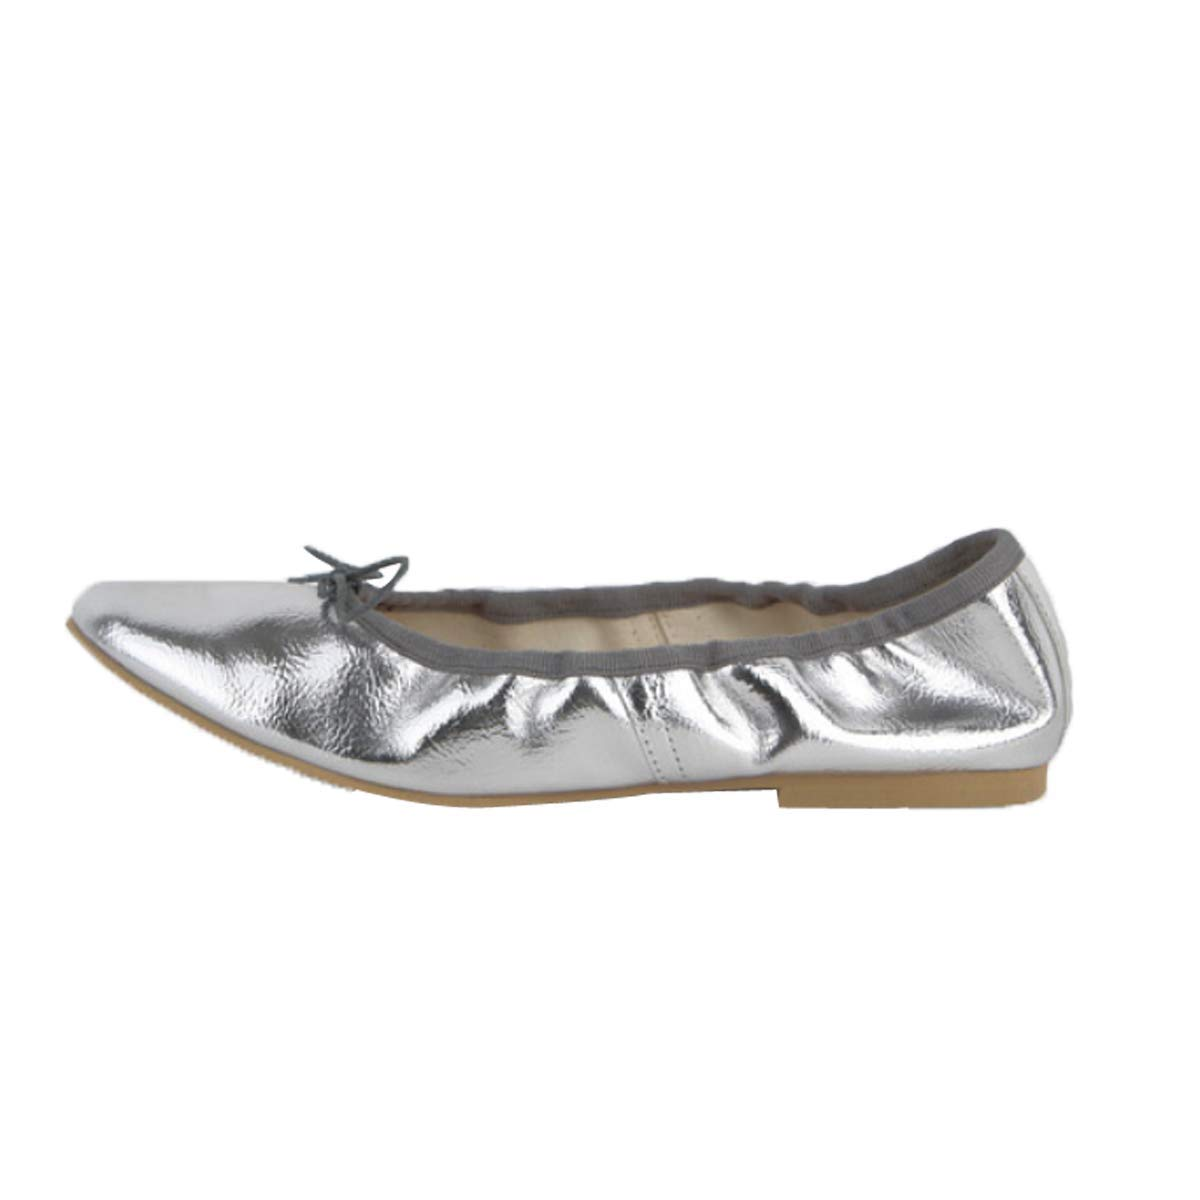 UfunUshime Bowtie Ballet Flats for Womens Round Toe Soft Dress Shoes